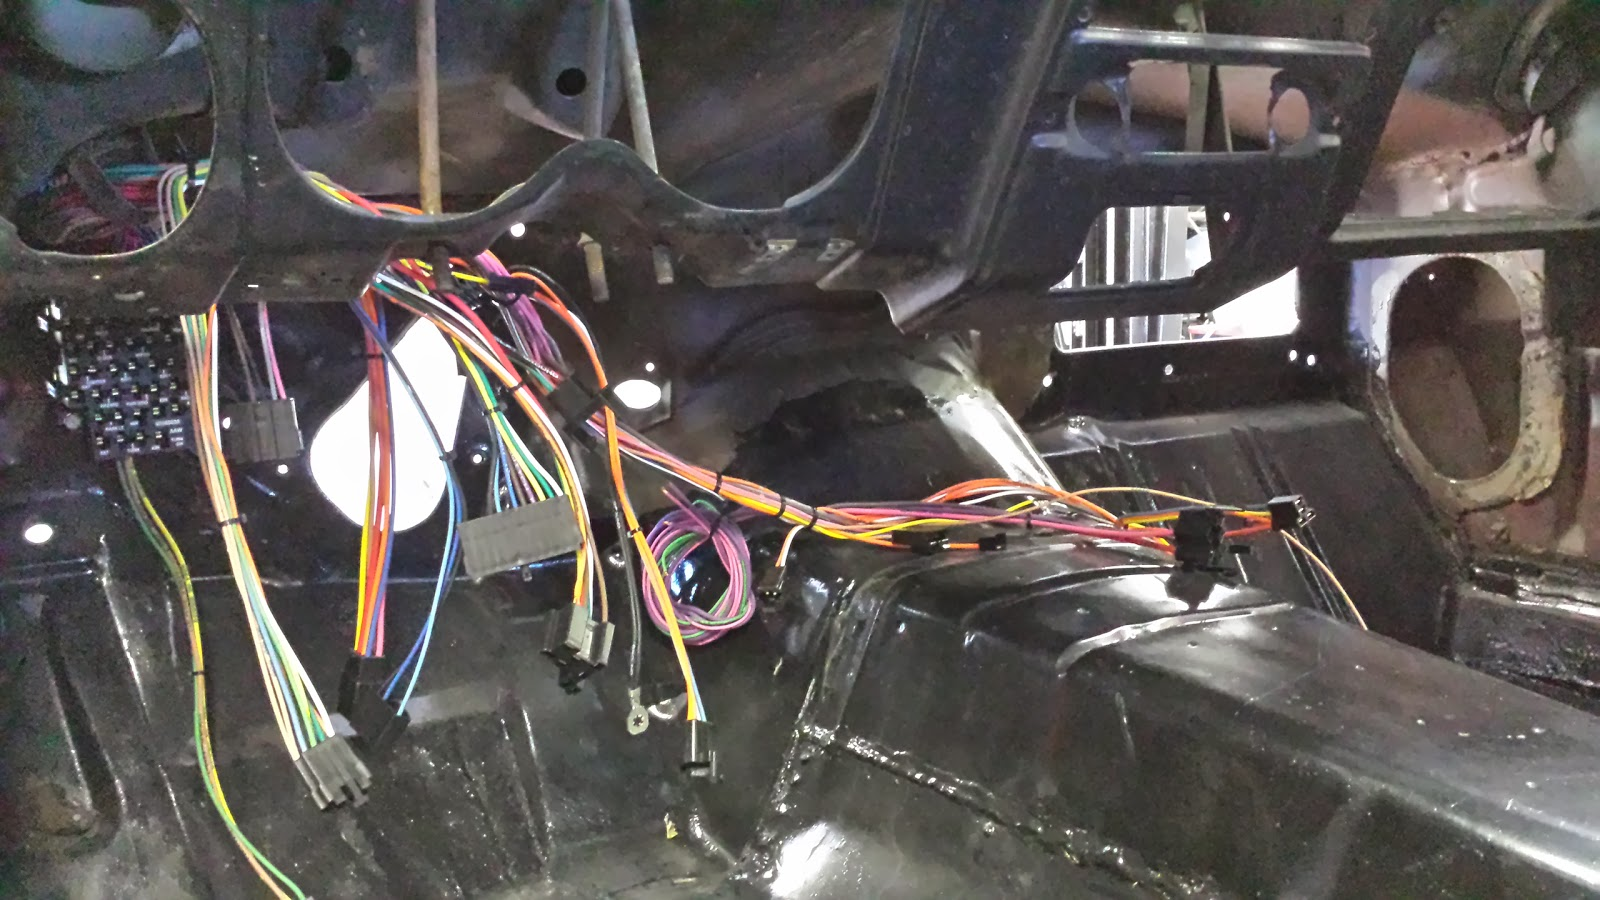 20131130_101407 68 camaro ls1 conversion blog 68 camaro ls1 wiring harness at suagrazia.org